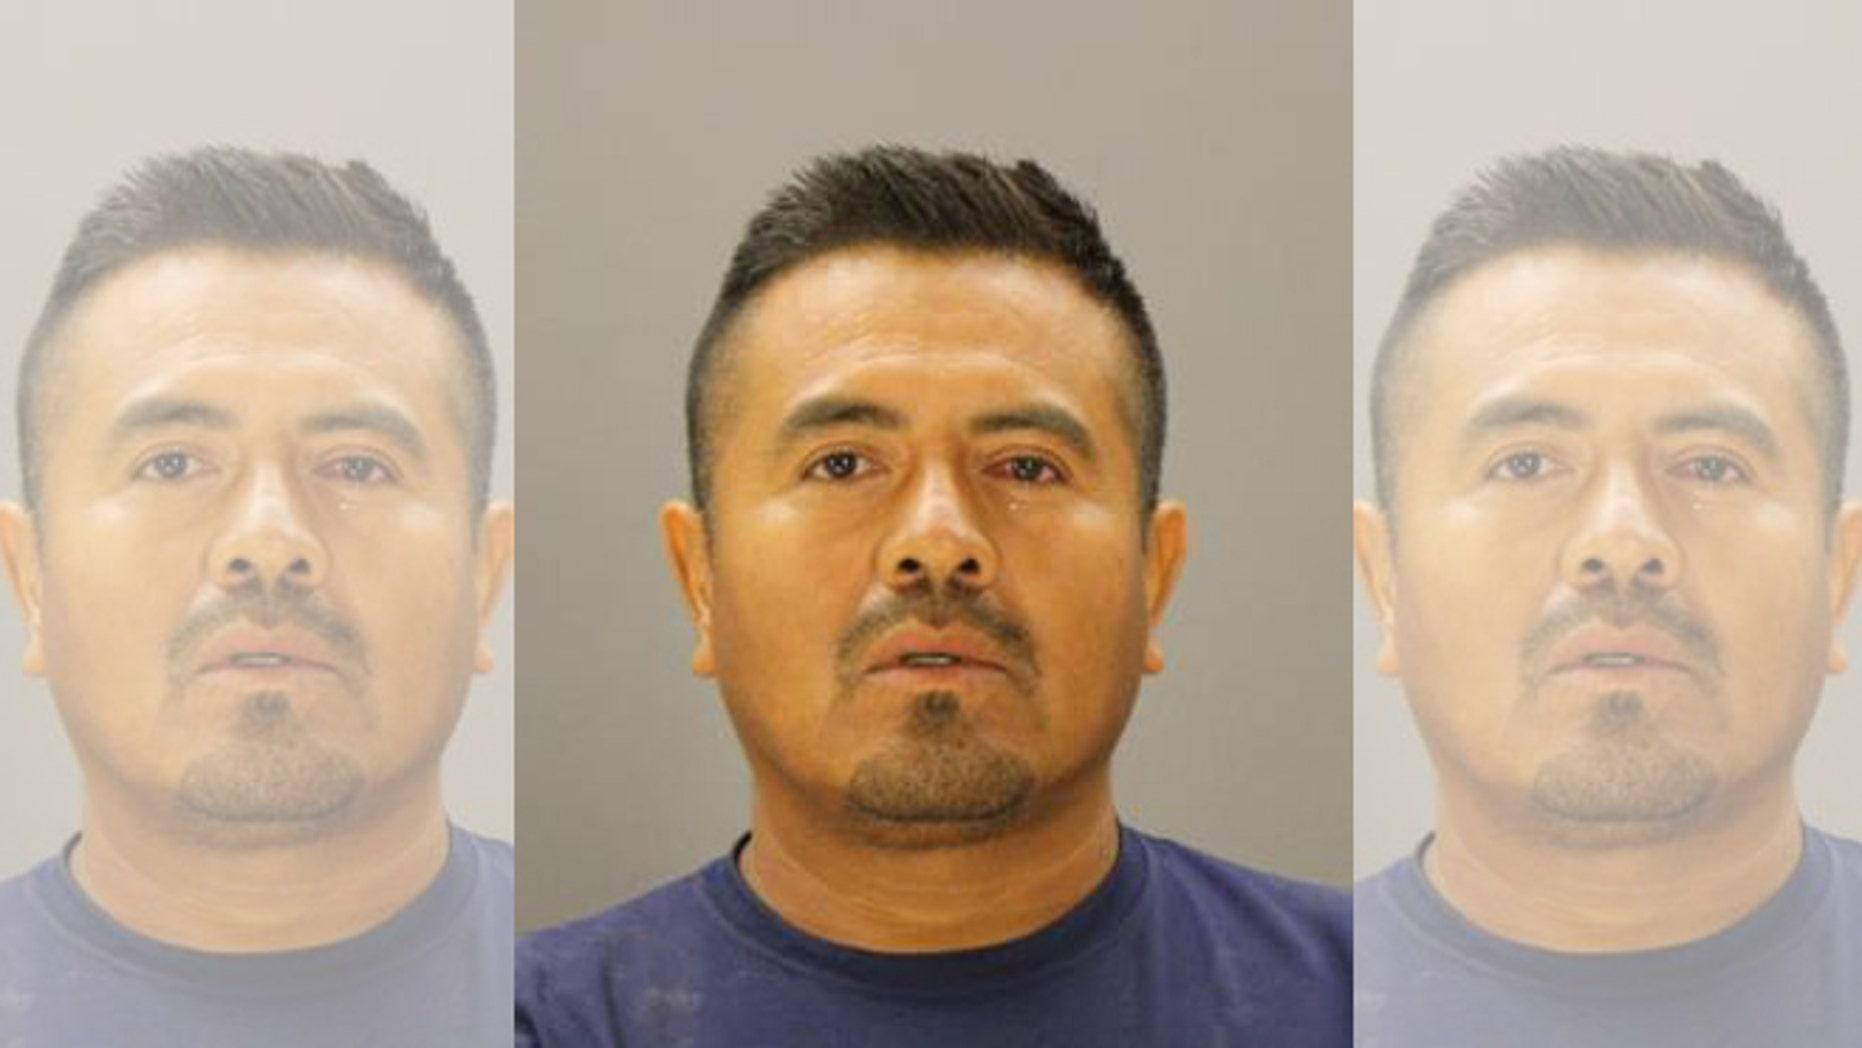 Roberto Laguna Landin. (Photo: Dallas County Sheriff's Office)